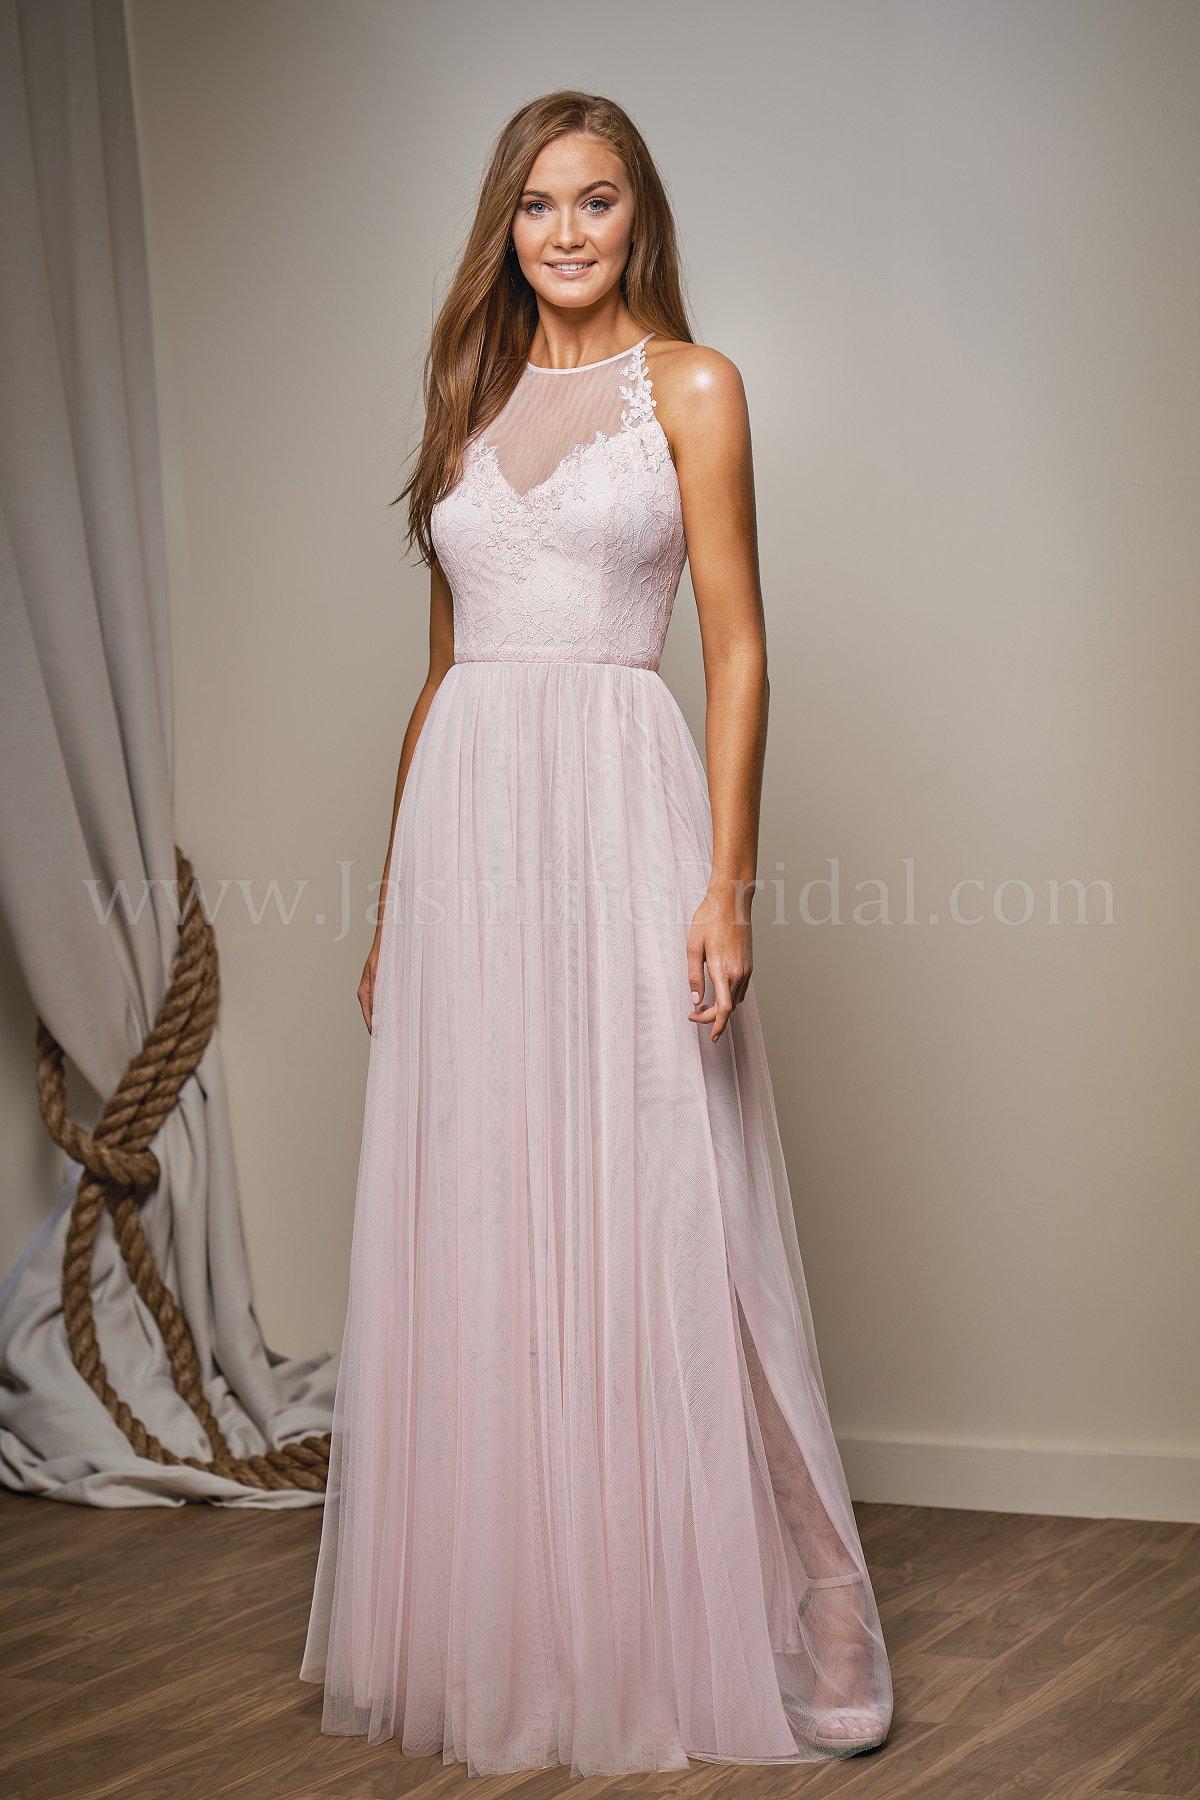 L204009 long illusion neckline lace soft tulle bridesmaid dress ombrellifo Images